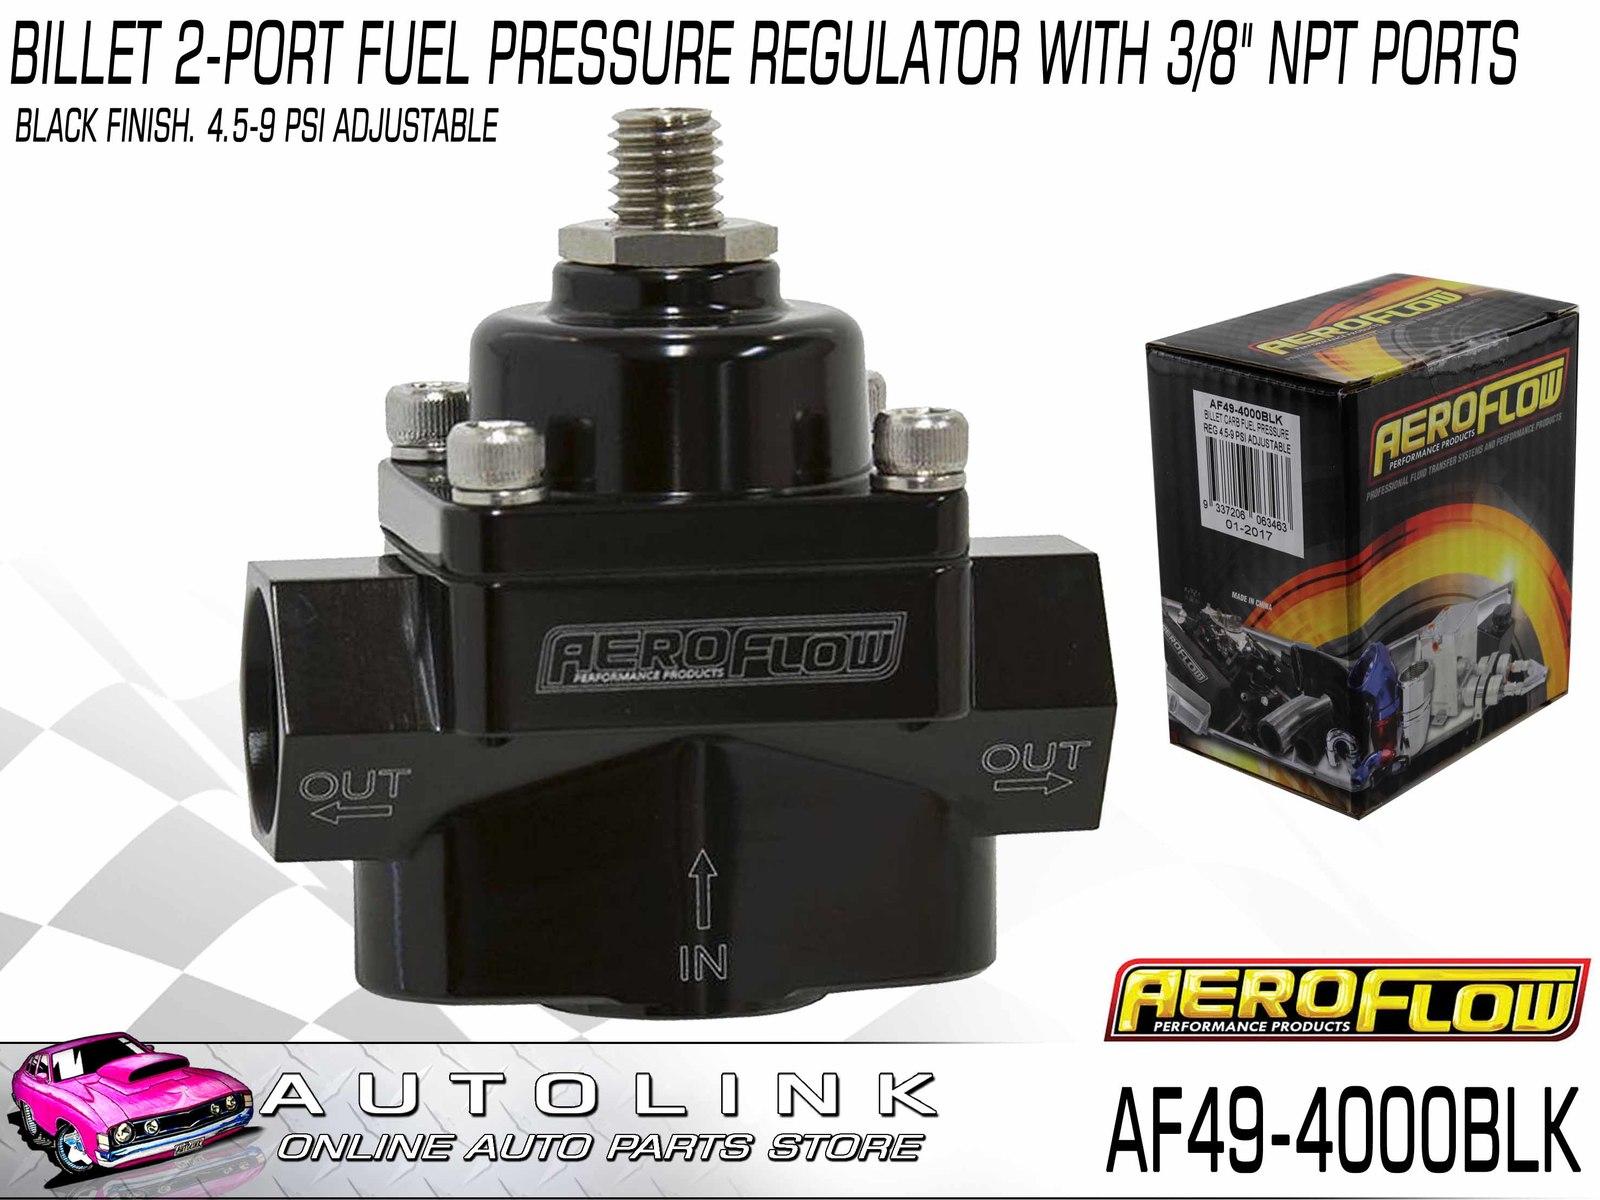 aeroflow fuel pressure regulator instructions